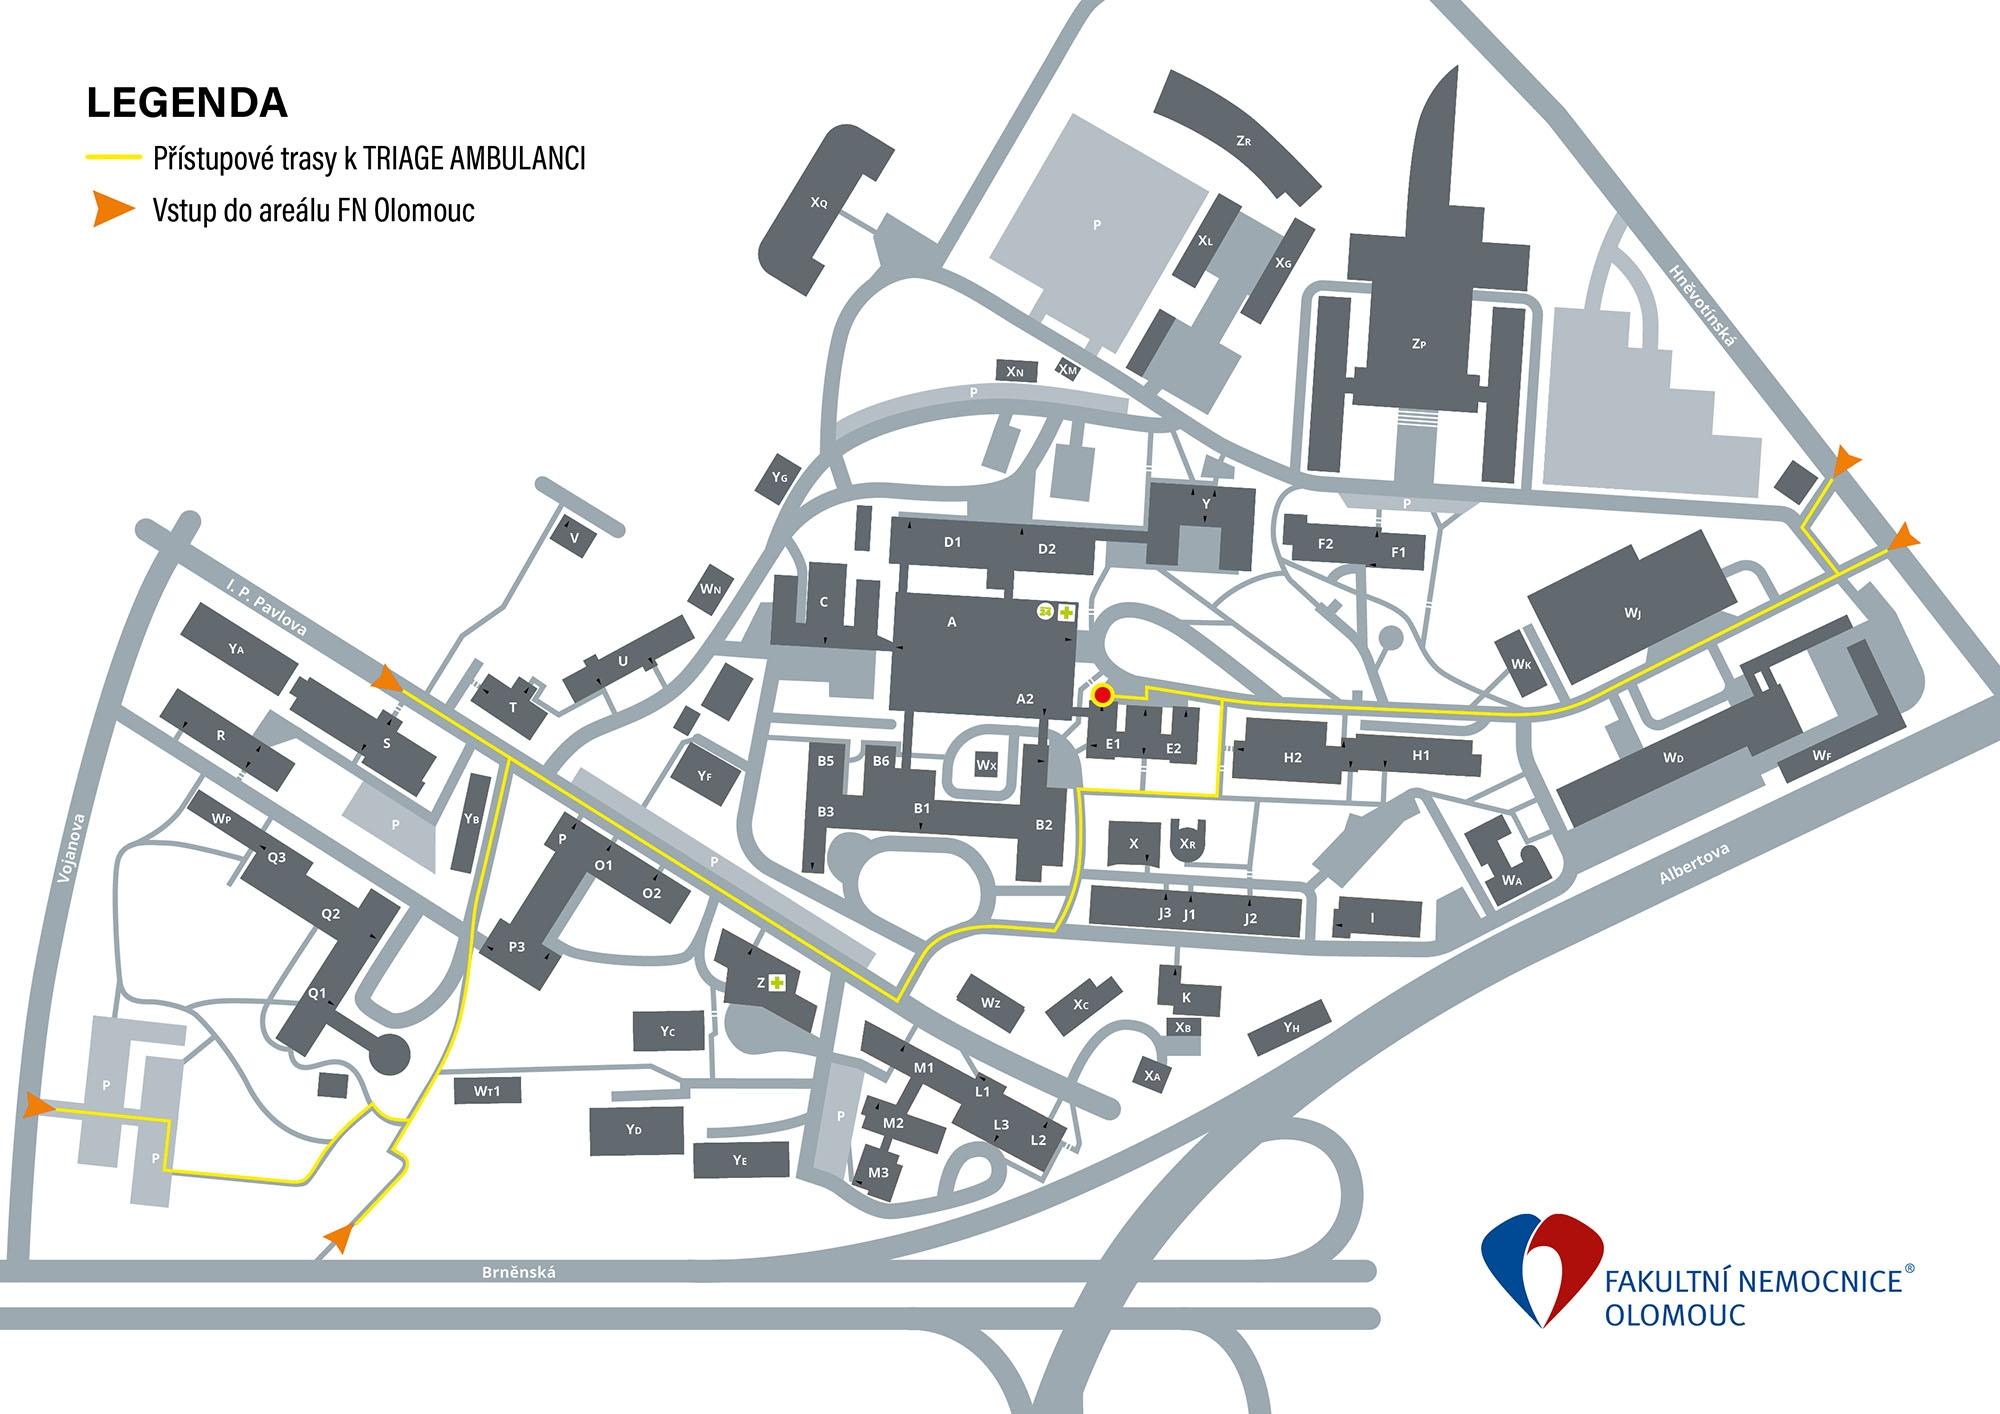 mapa zdroj: FNOL